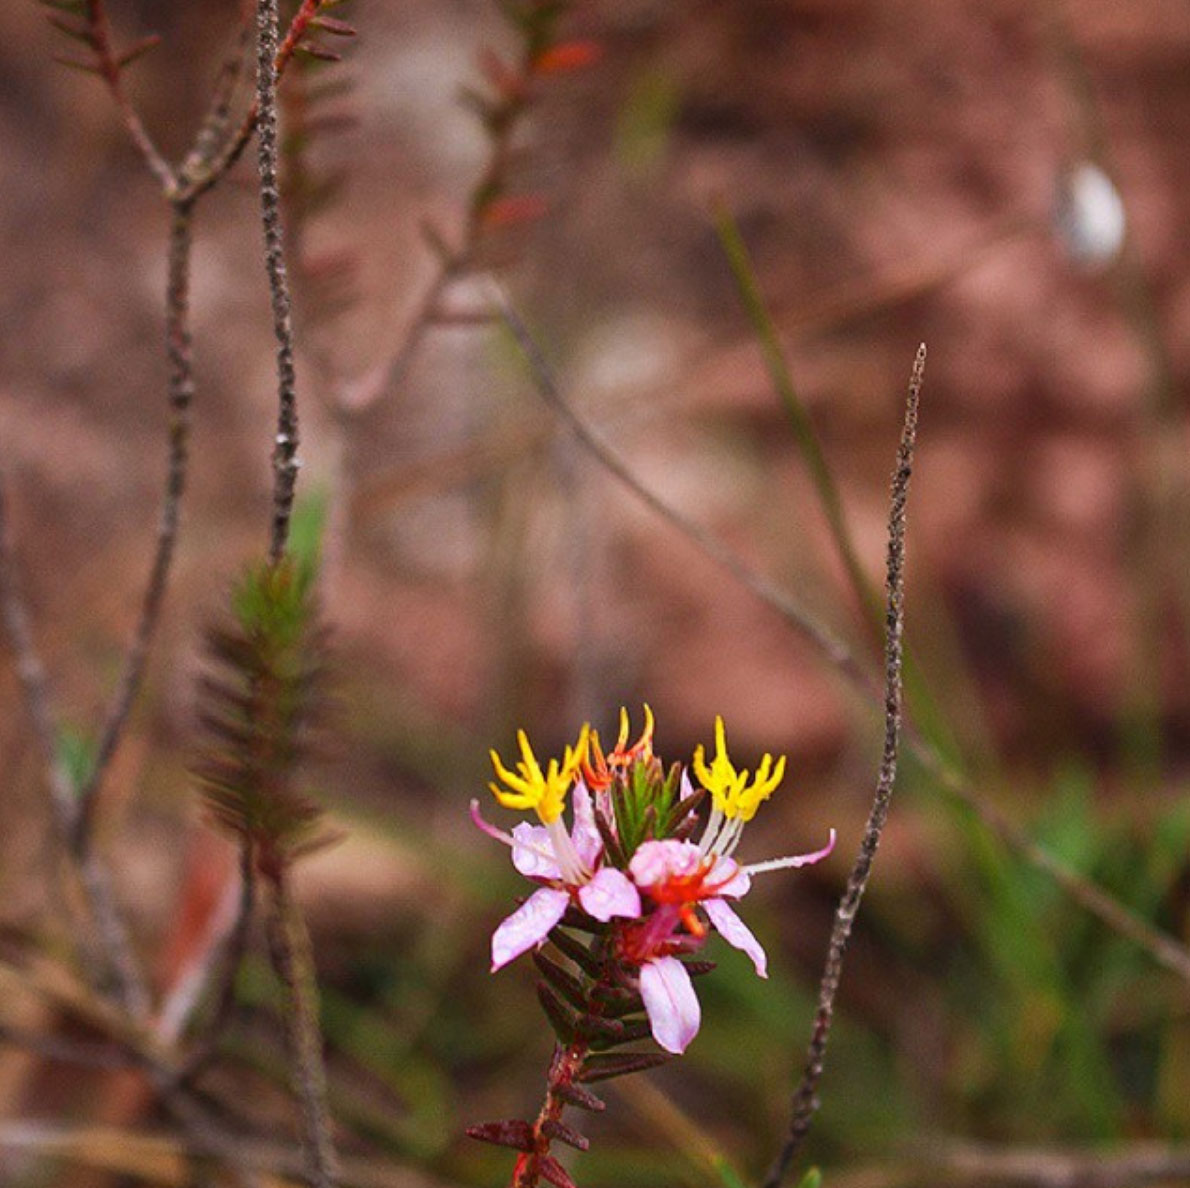 Nature in the Roraima